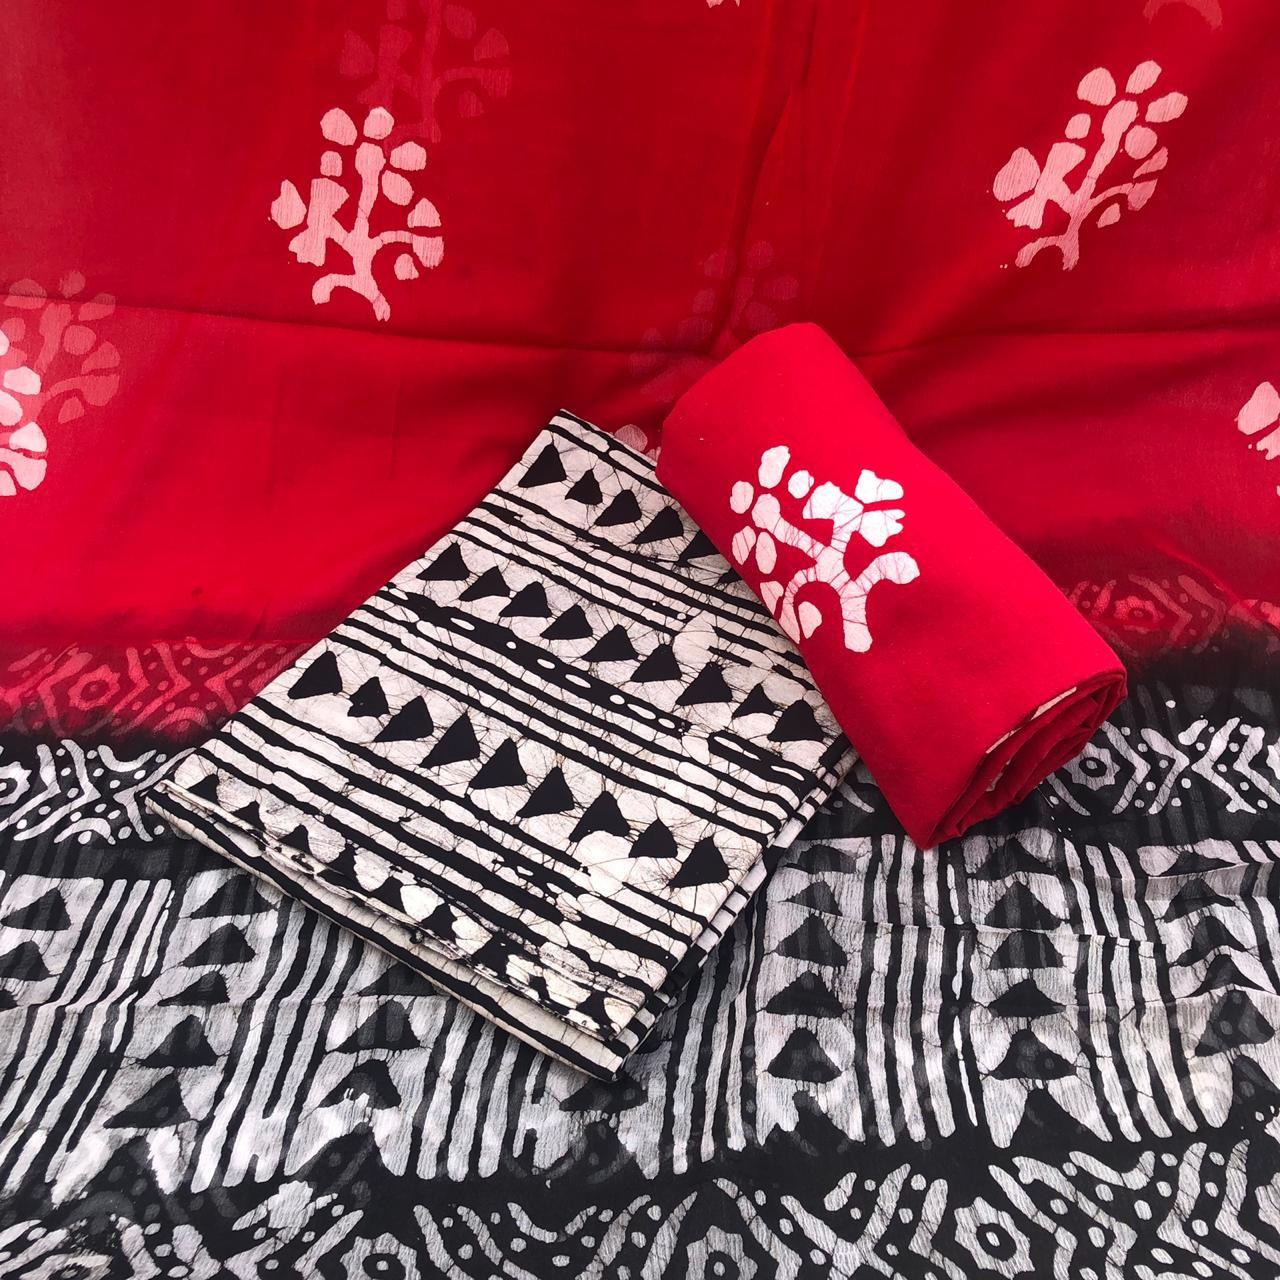 Exclusive Summer Cotton Collection Of Unstitched Cotton Salwar Suits With Chiffon Dupatta Hand Block Printed Block Print Saree Bagru Print